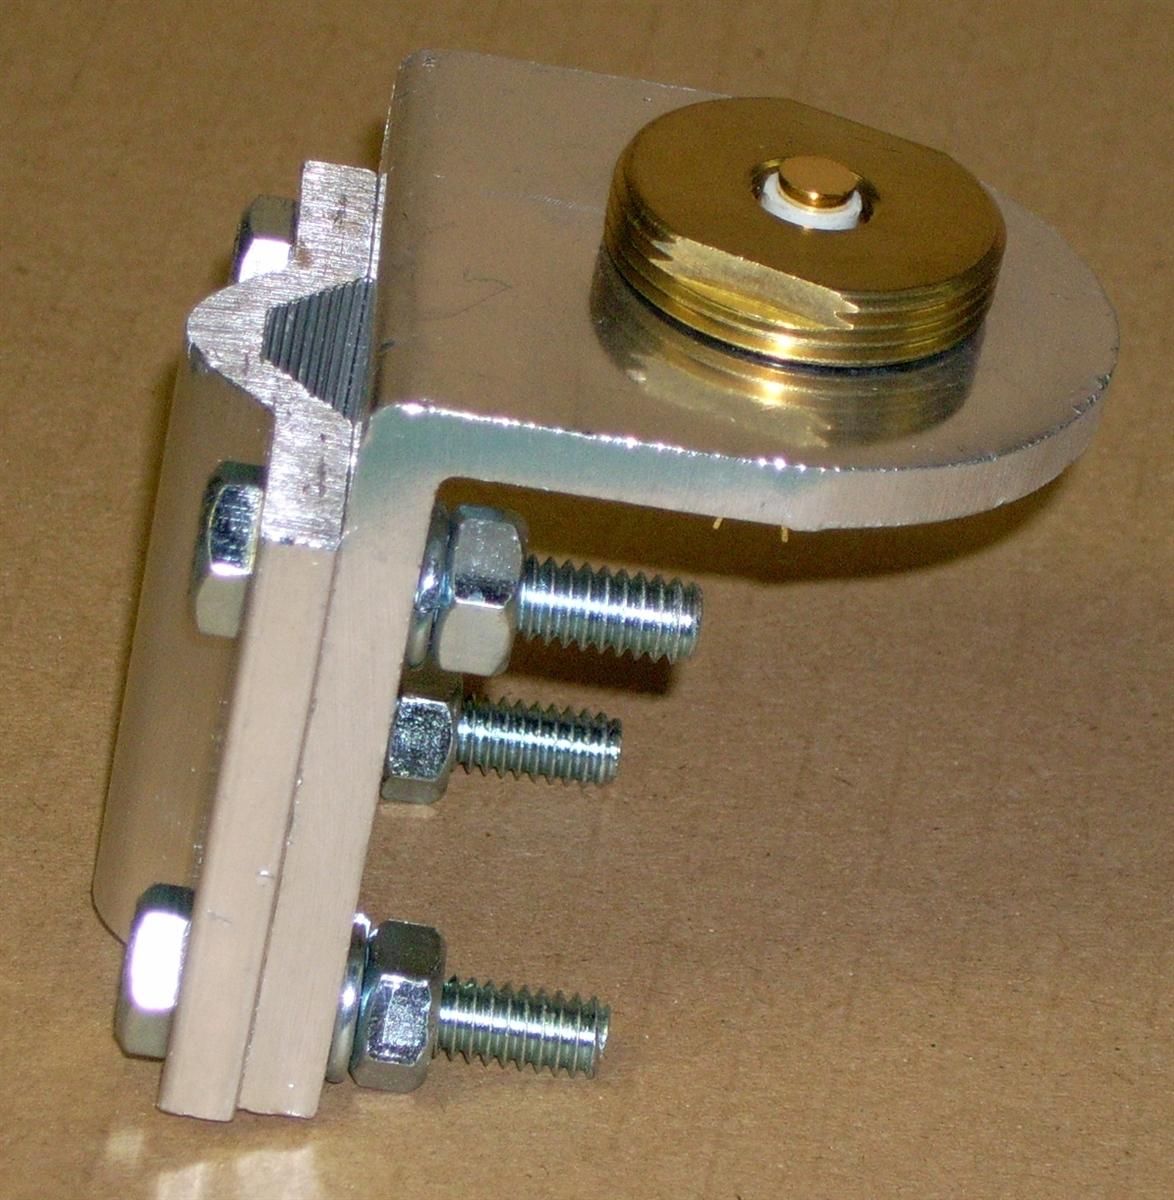 Aluminum Mirror Mount Bracket ~ Radio Antenna ~ For screw on coax cable